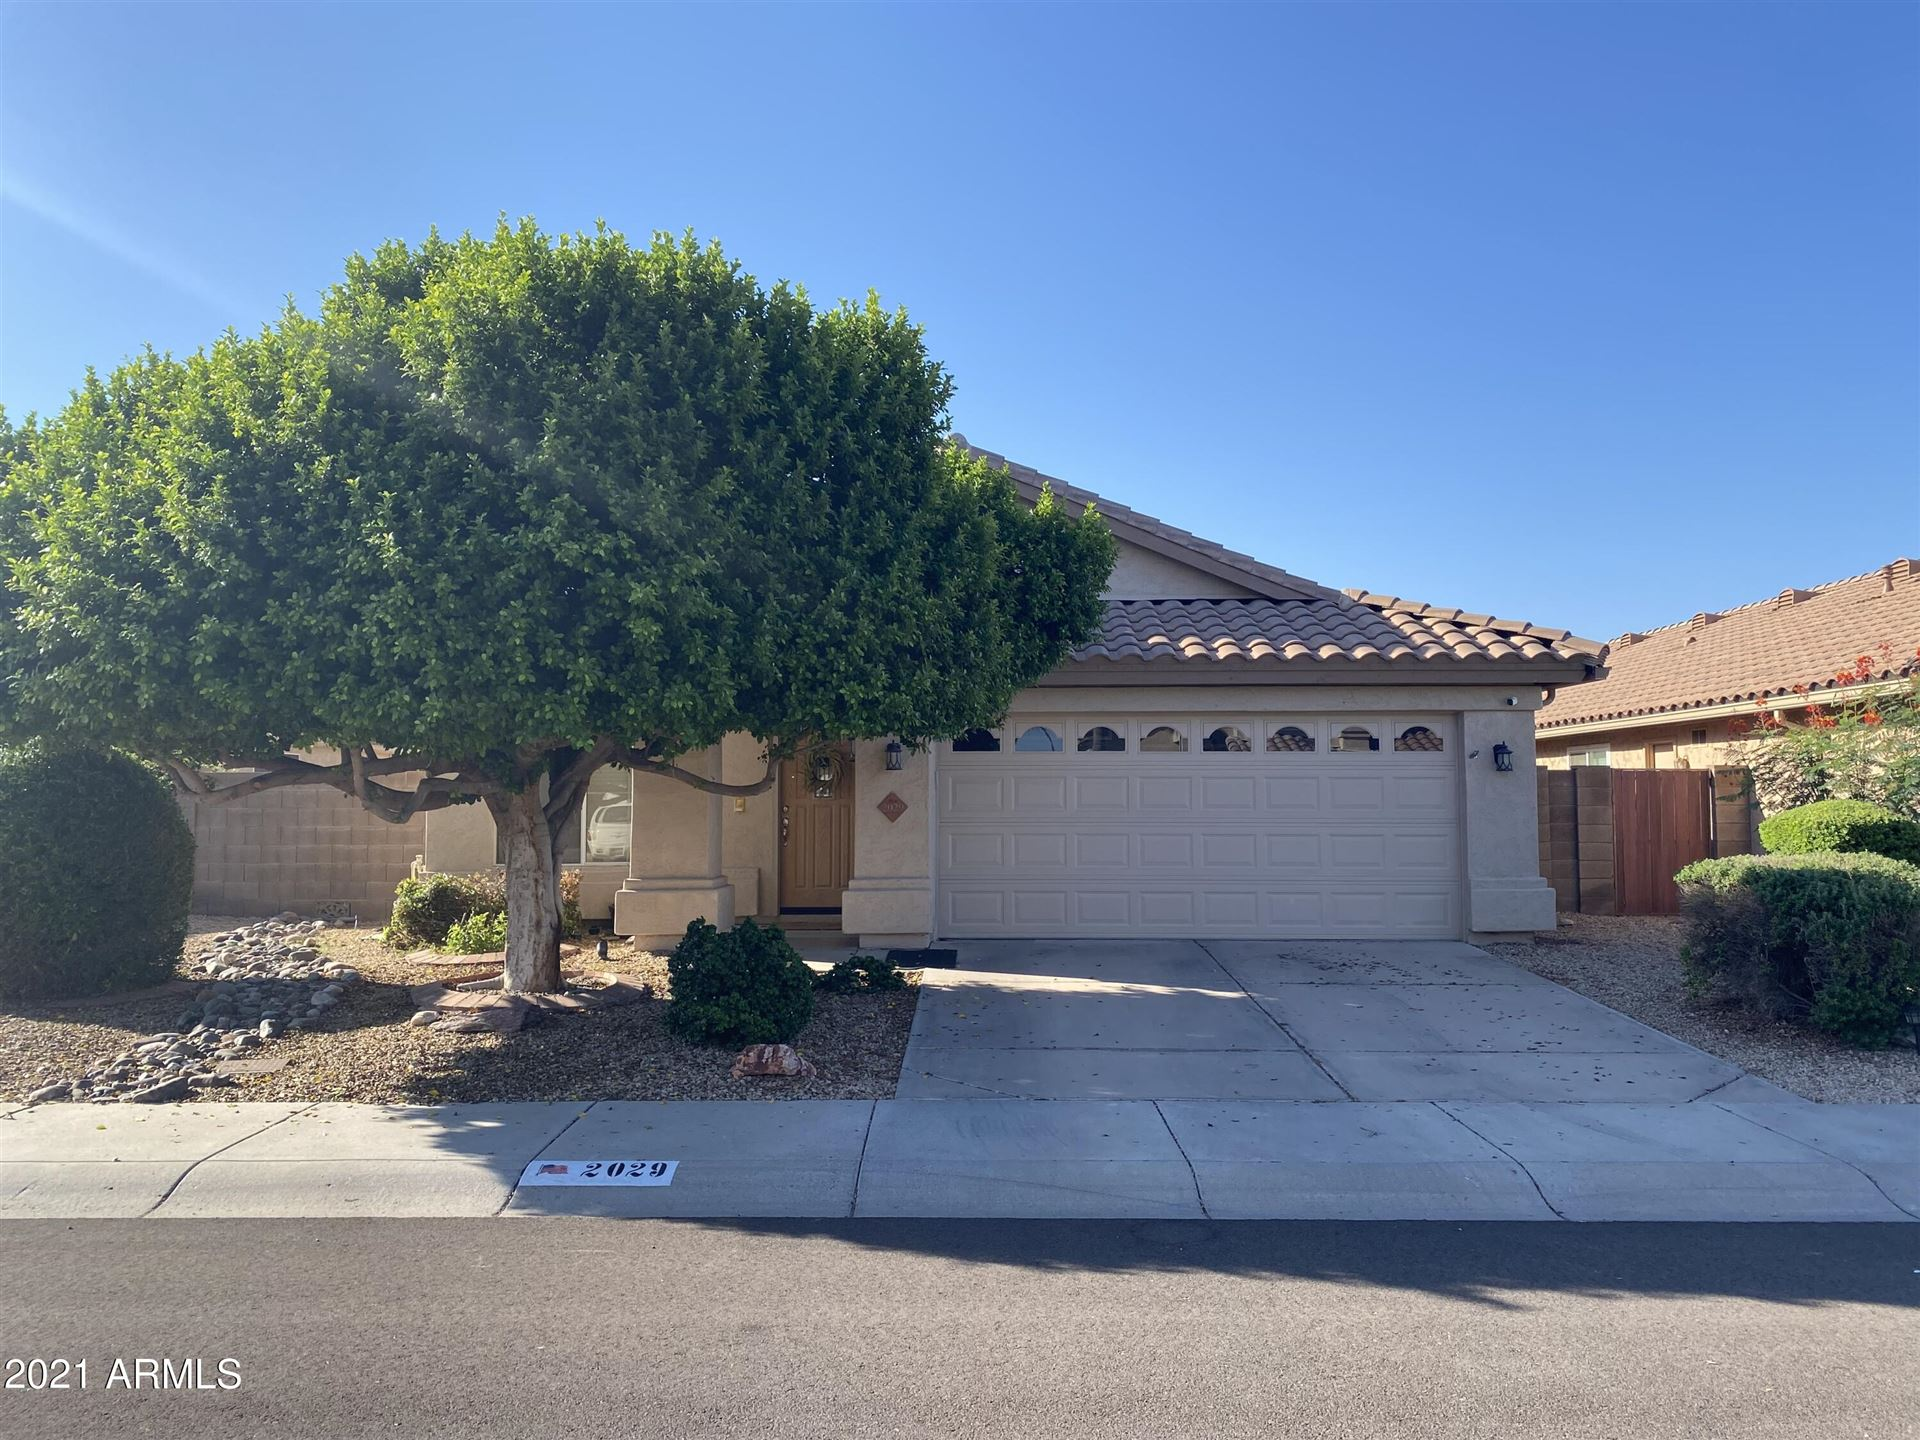 2029 E ANGELA Drive, Phoenix, AZ 85022 - MLS#: 6296923